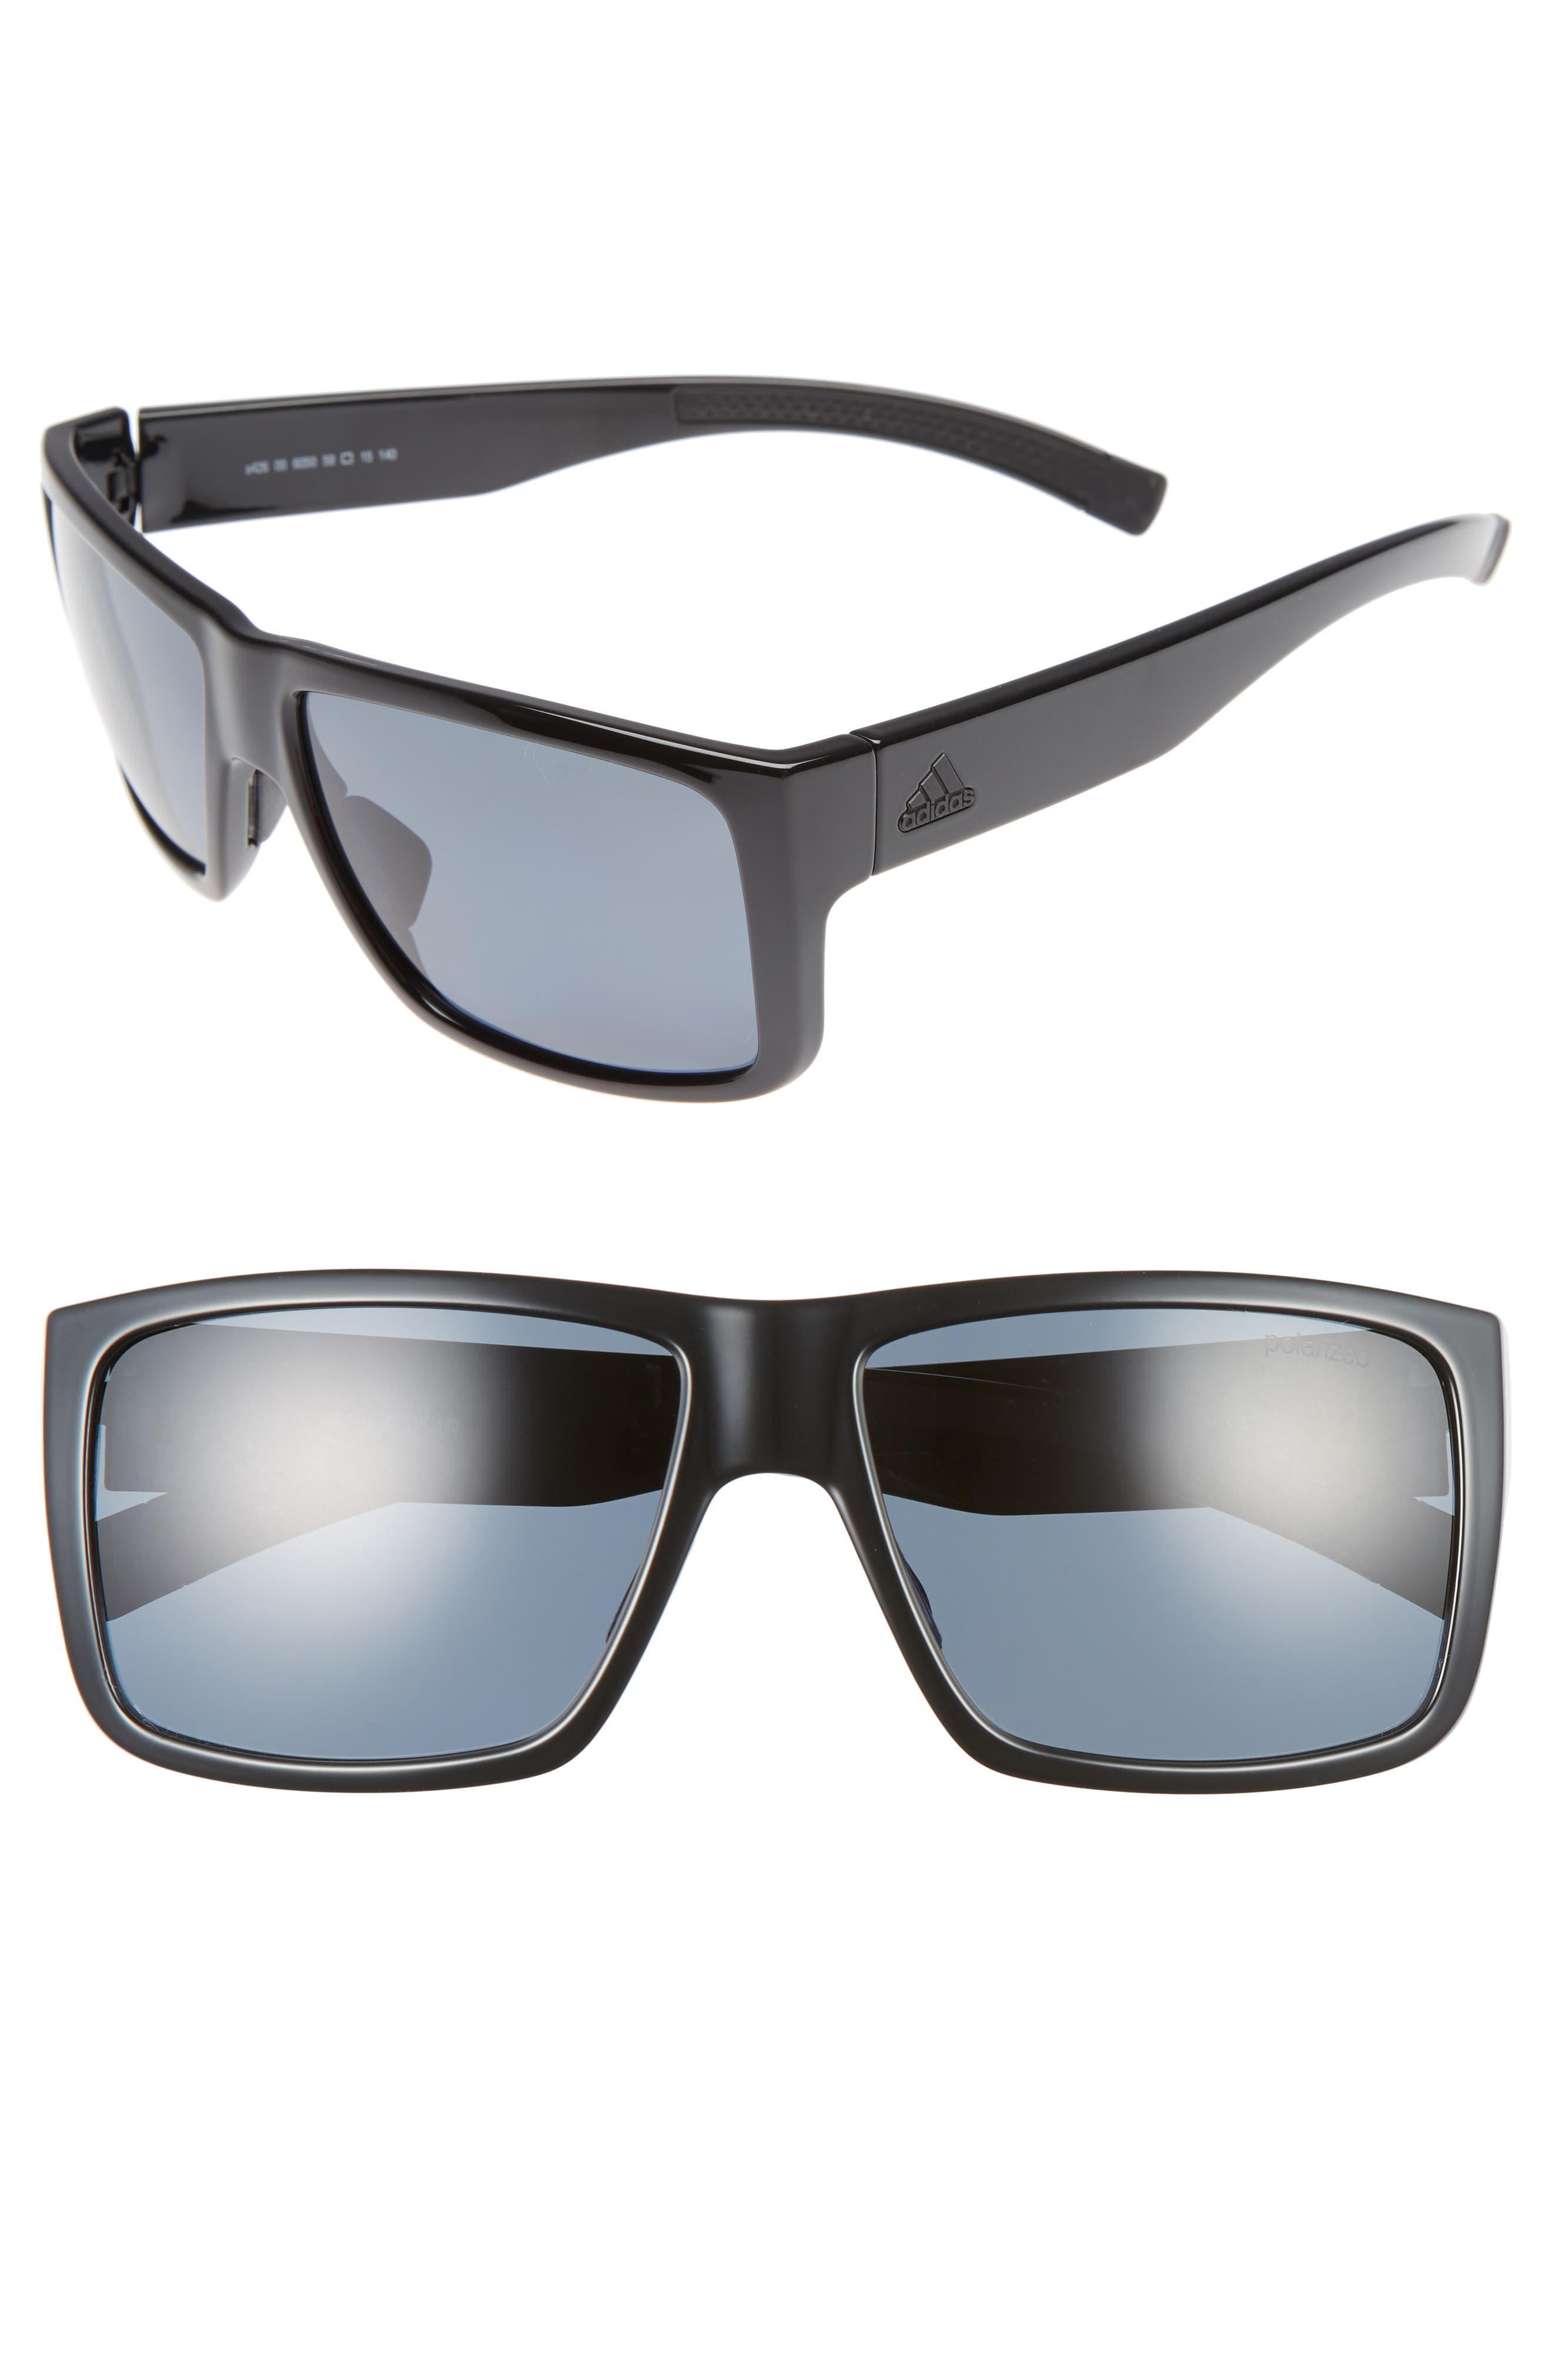 Matic 59mm Sunglasses,                             Main thumbnail 1, color,                             SHINY BLACK/ GREY POLAR